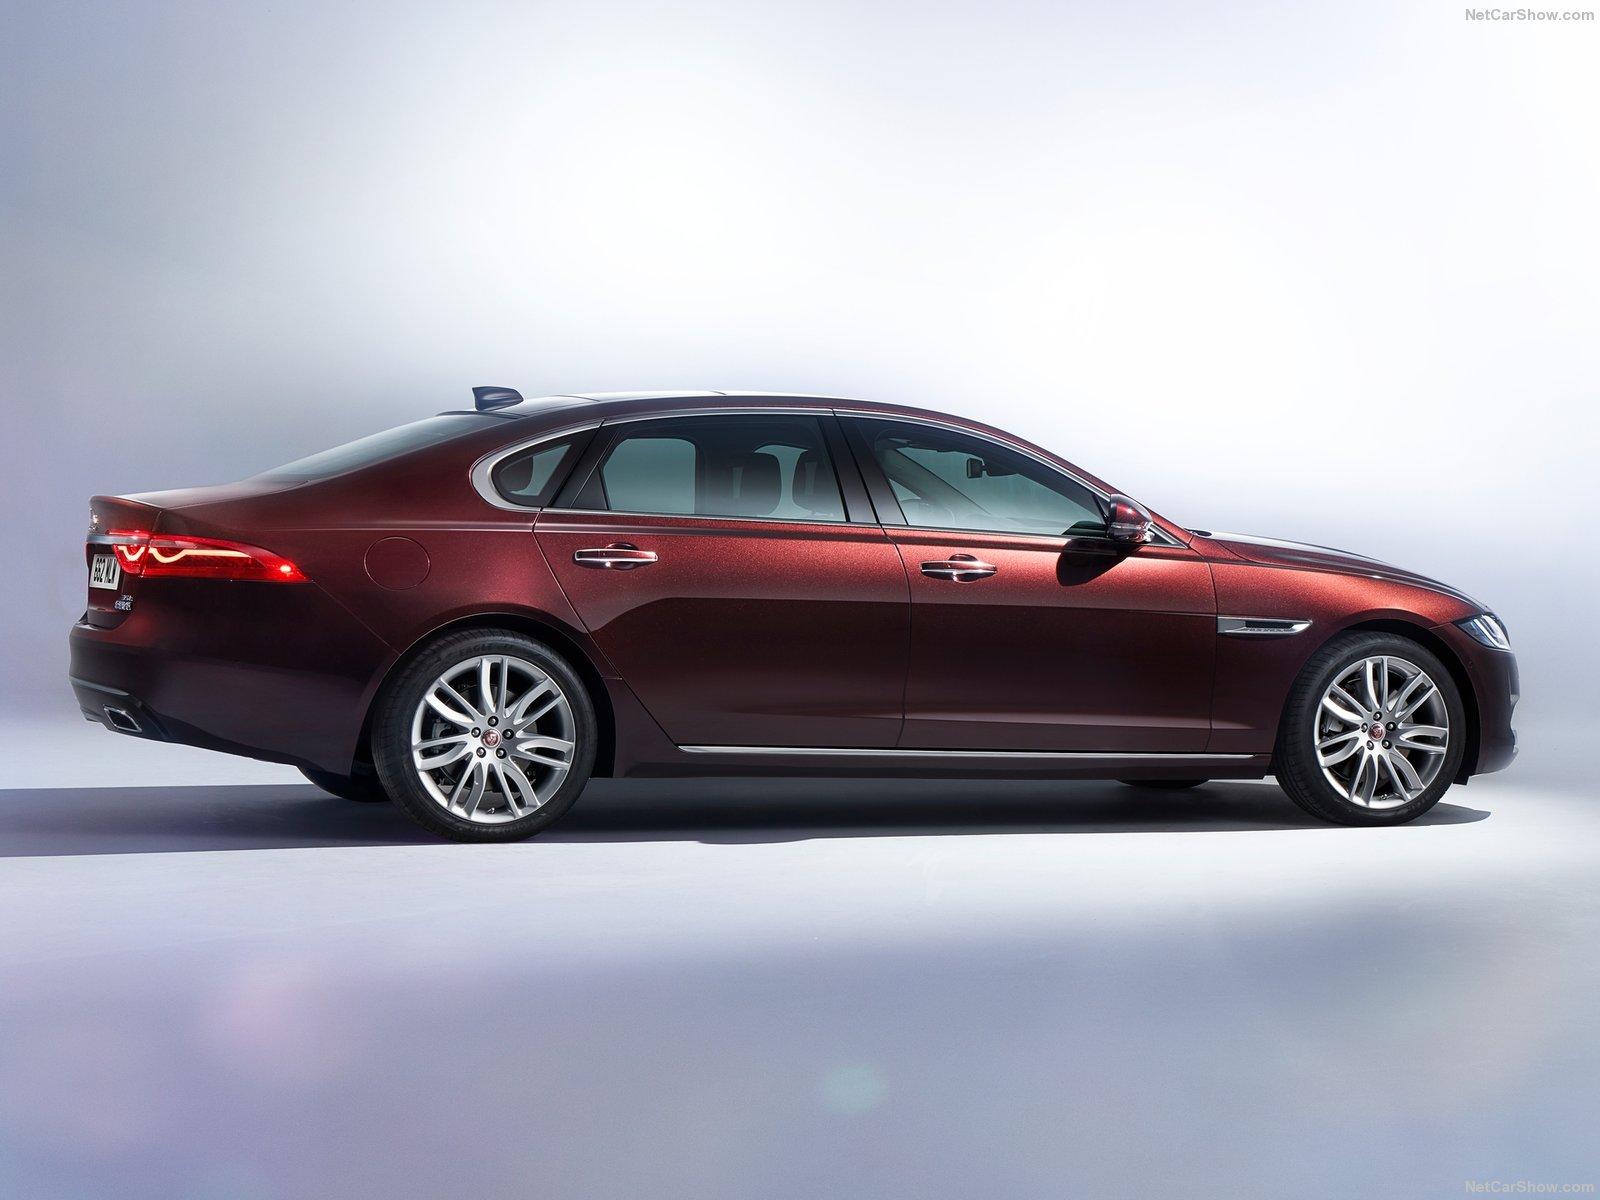 Jaguar-XFL-2017-1600-03.jpg